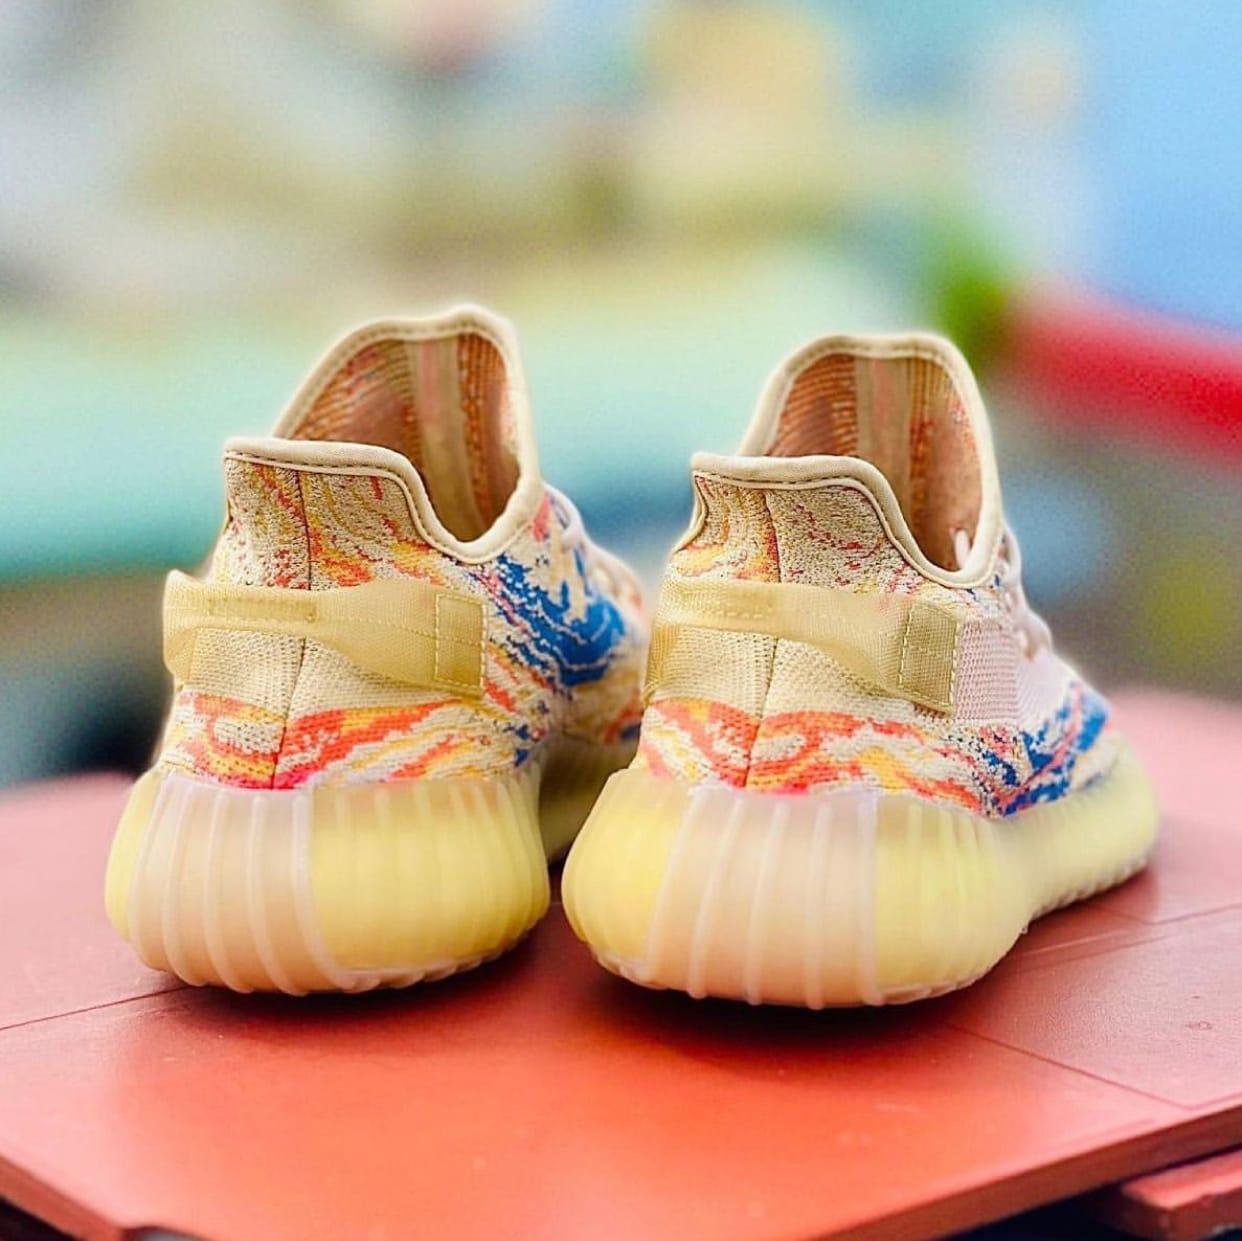 Adidas Yeezy Boost 350 V2 'MX Oat' (Heel)